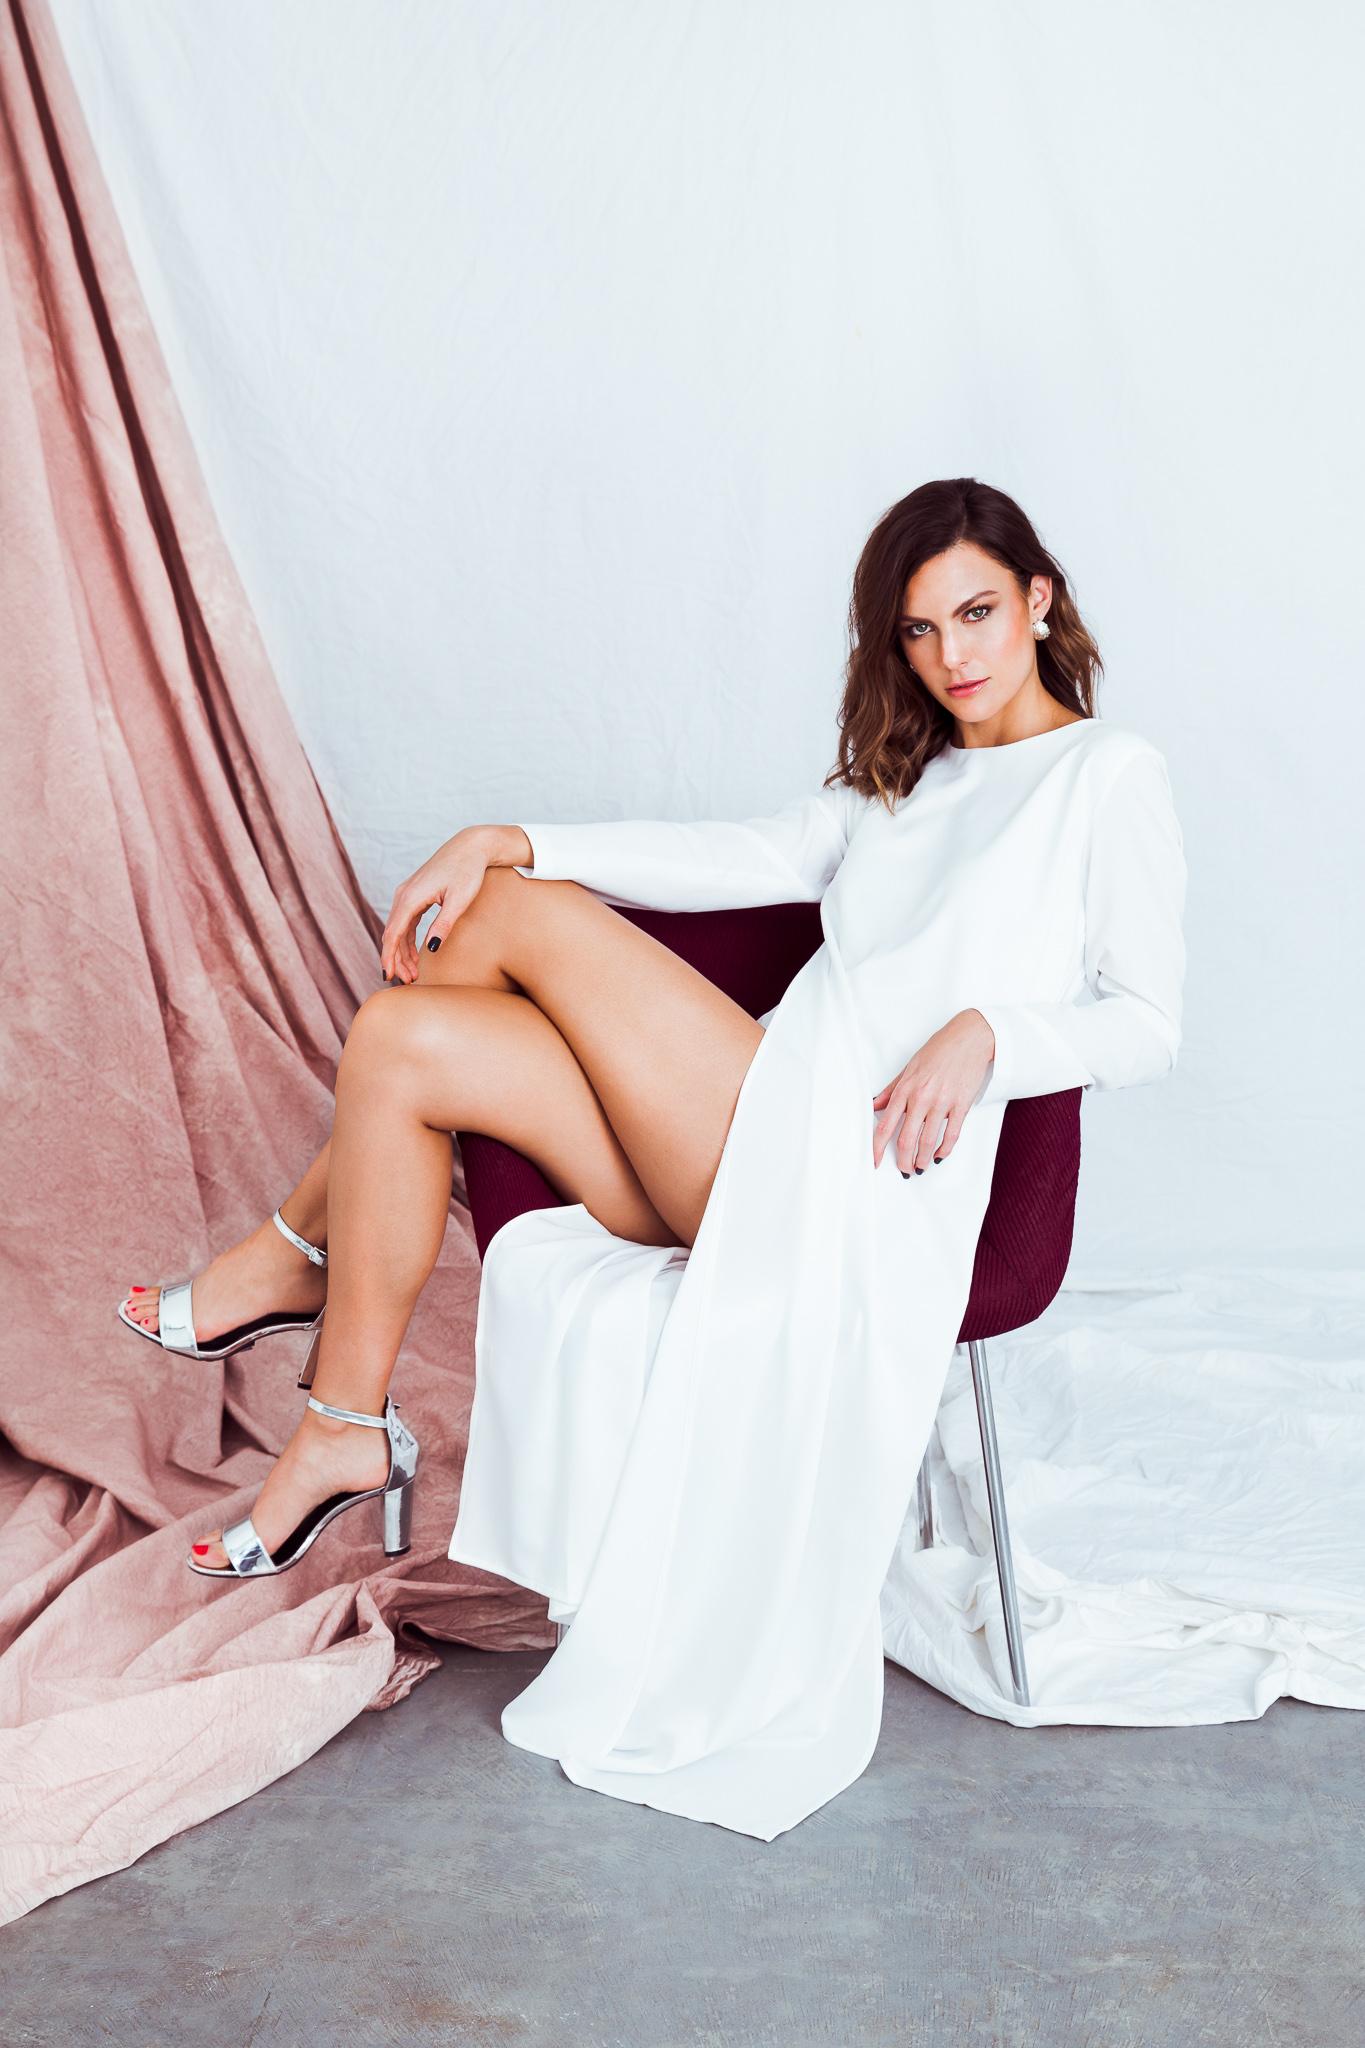 georgia quinn model beauty portrait beauty fashion photography melbourne australia commercial_-18.jpg